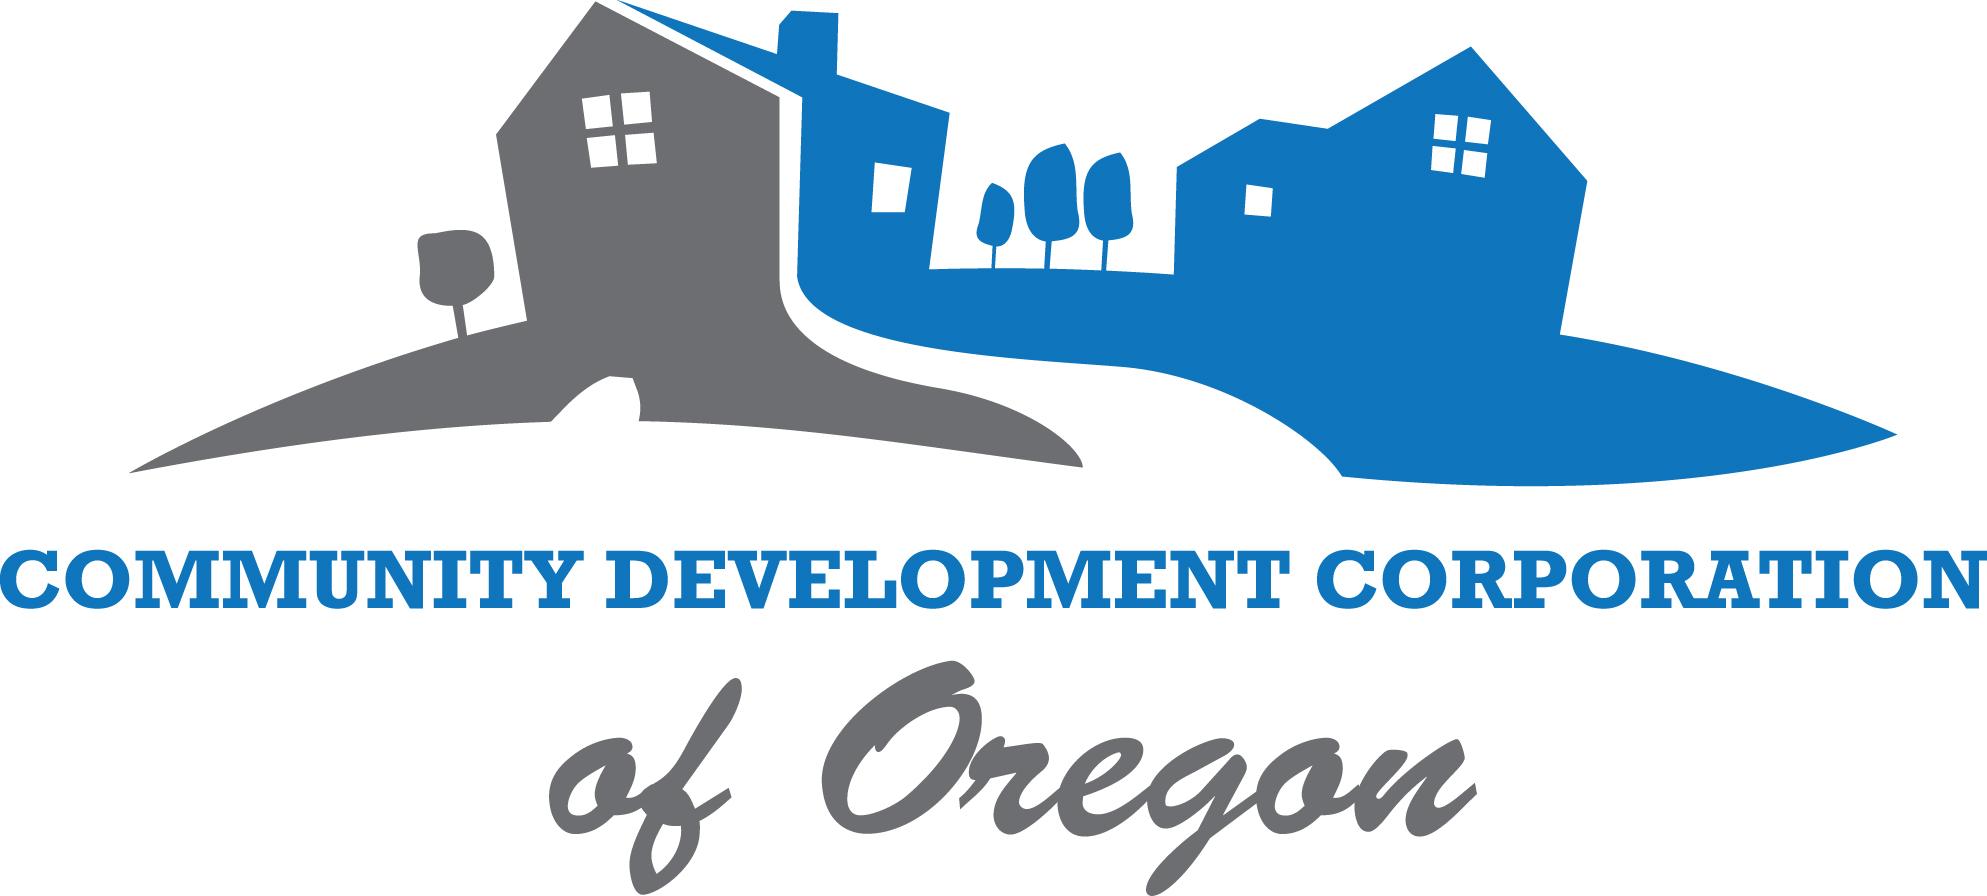 Community Development Corporation of Oregon